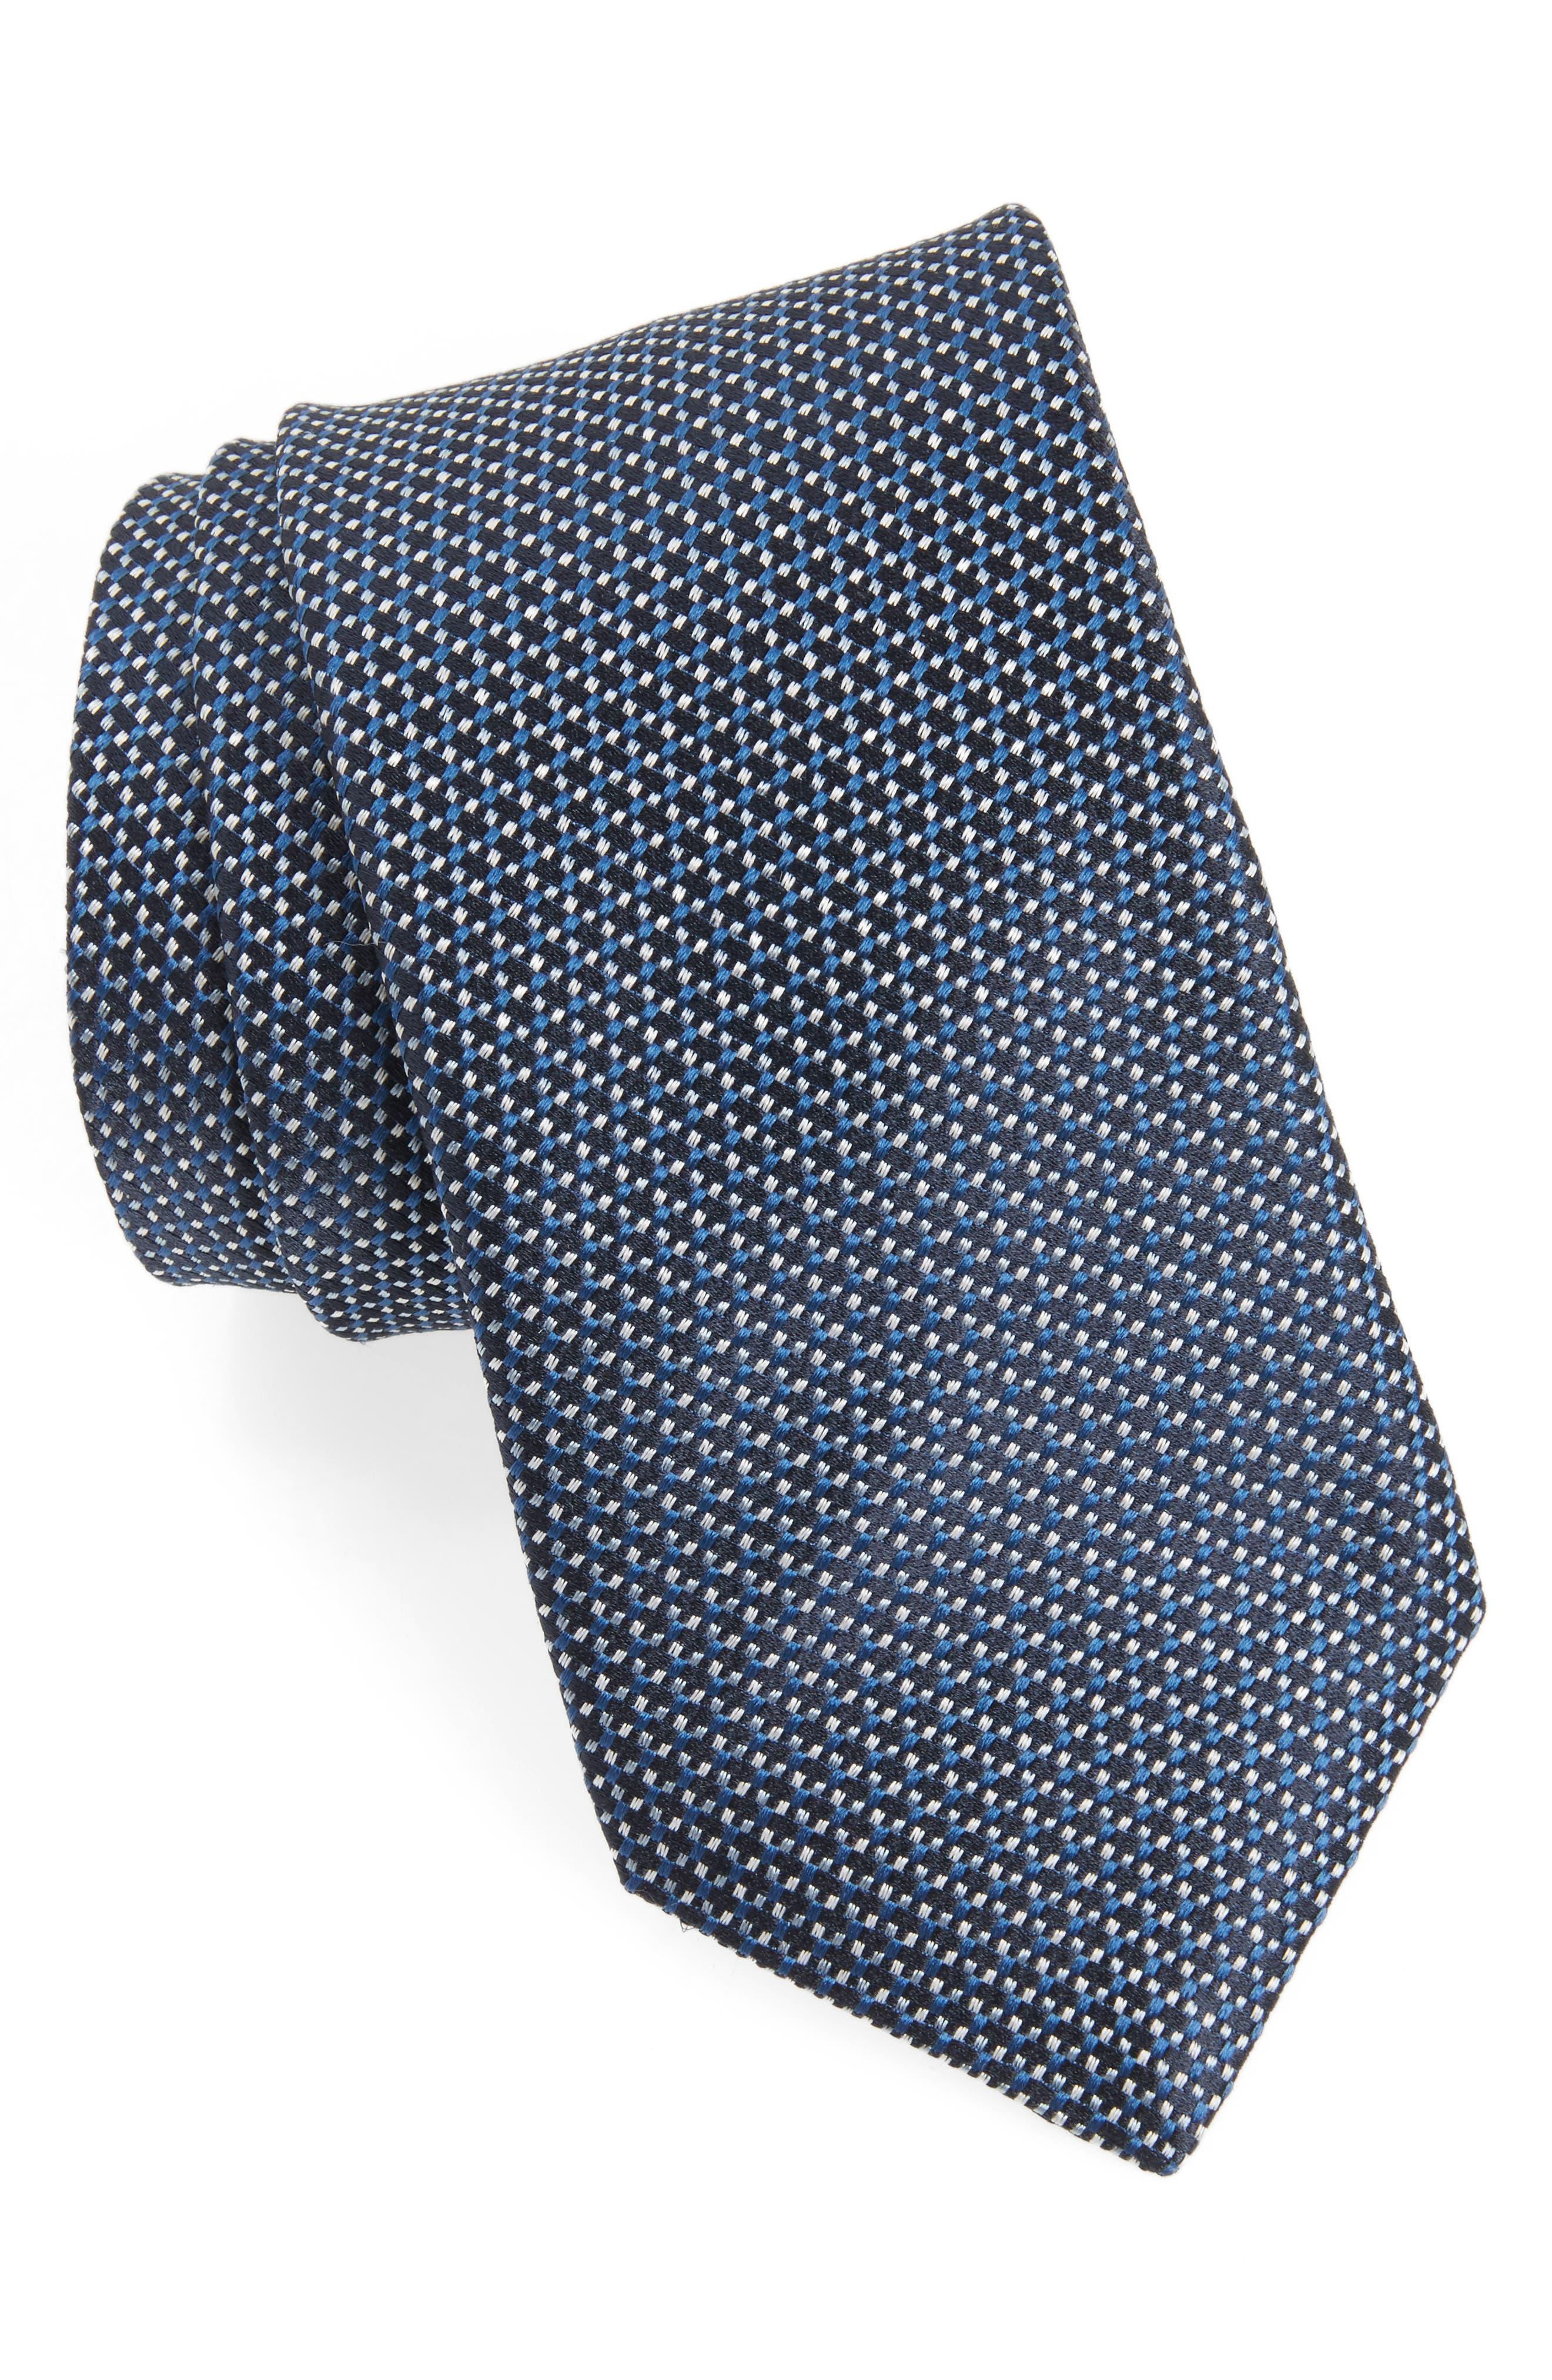 Geometric Tie,                             Main thumbnail 1, color,                             Stream Blue